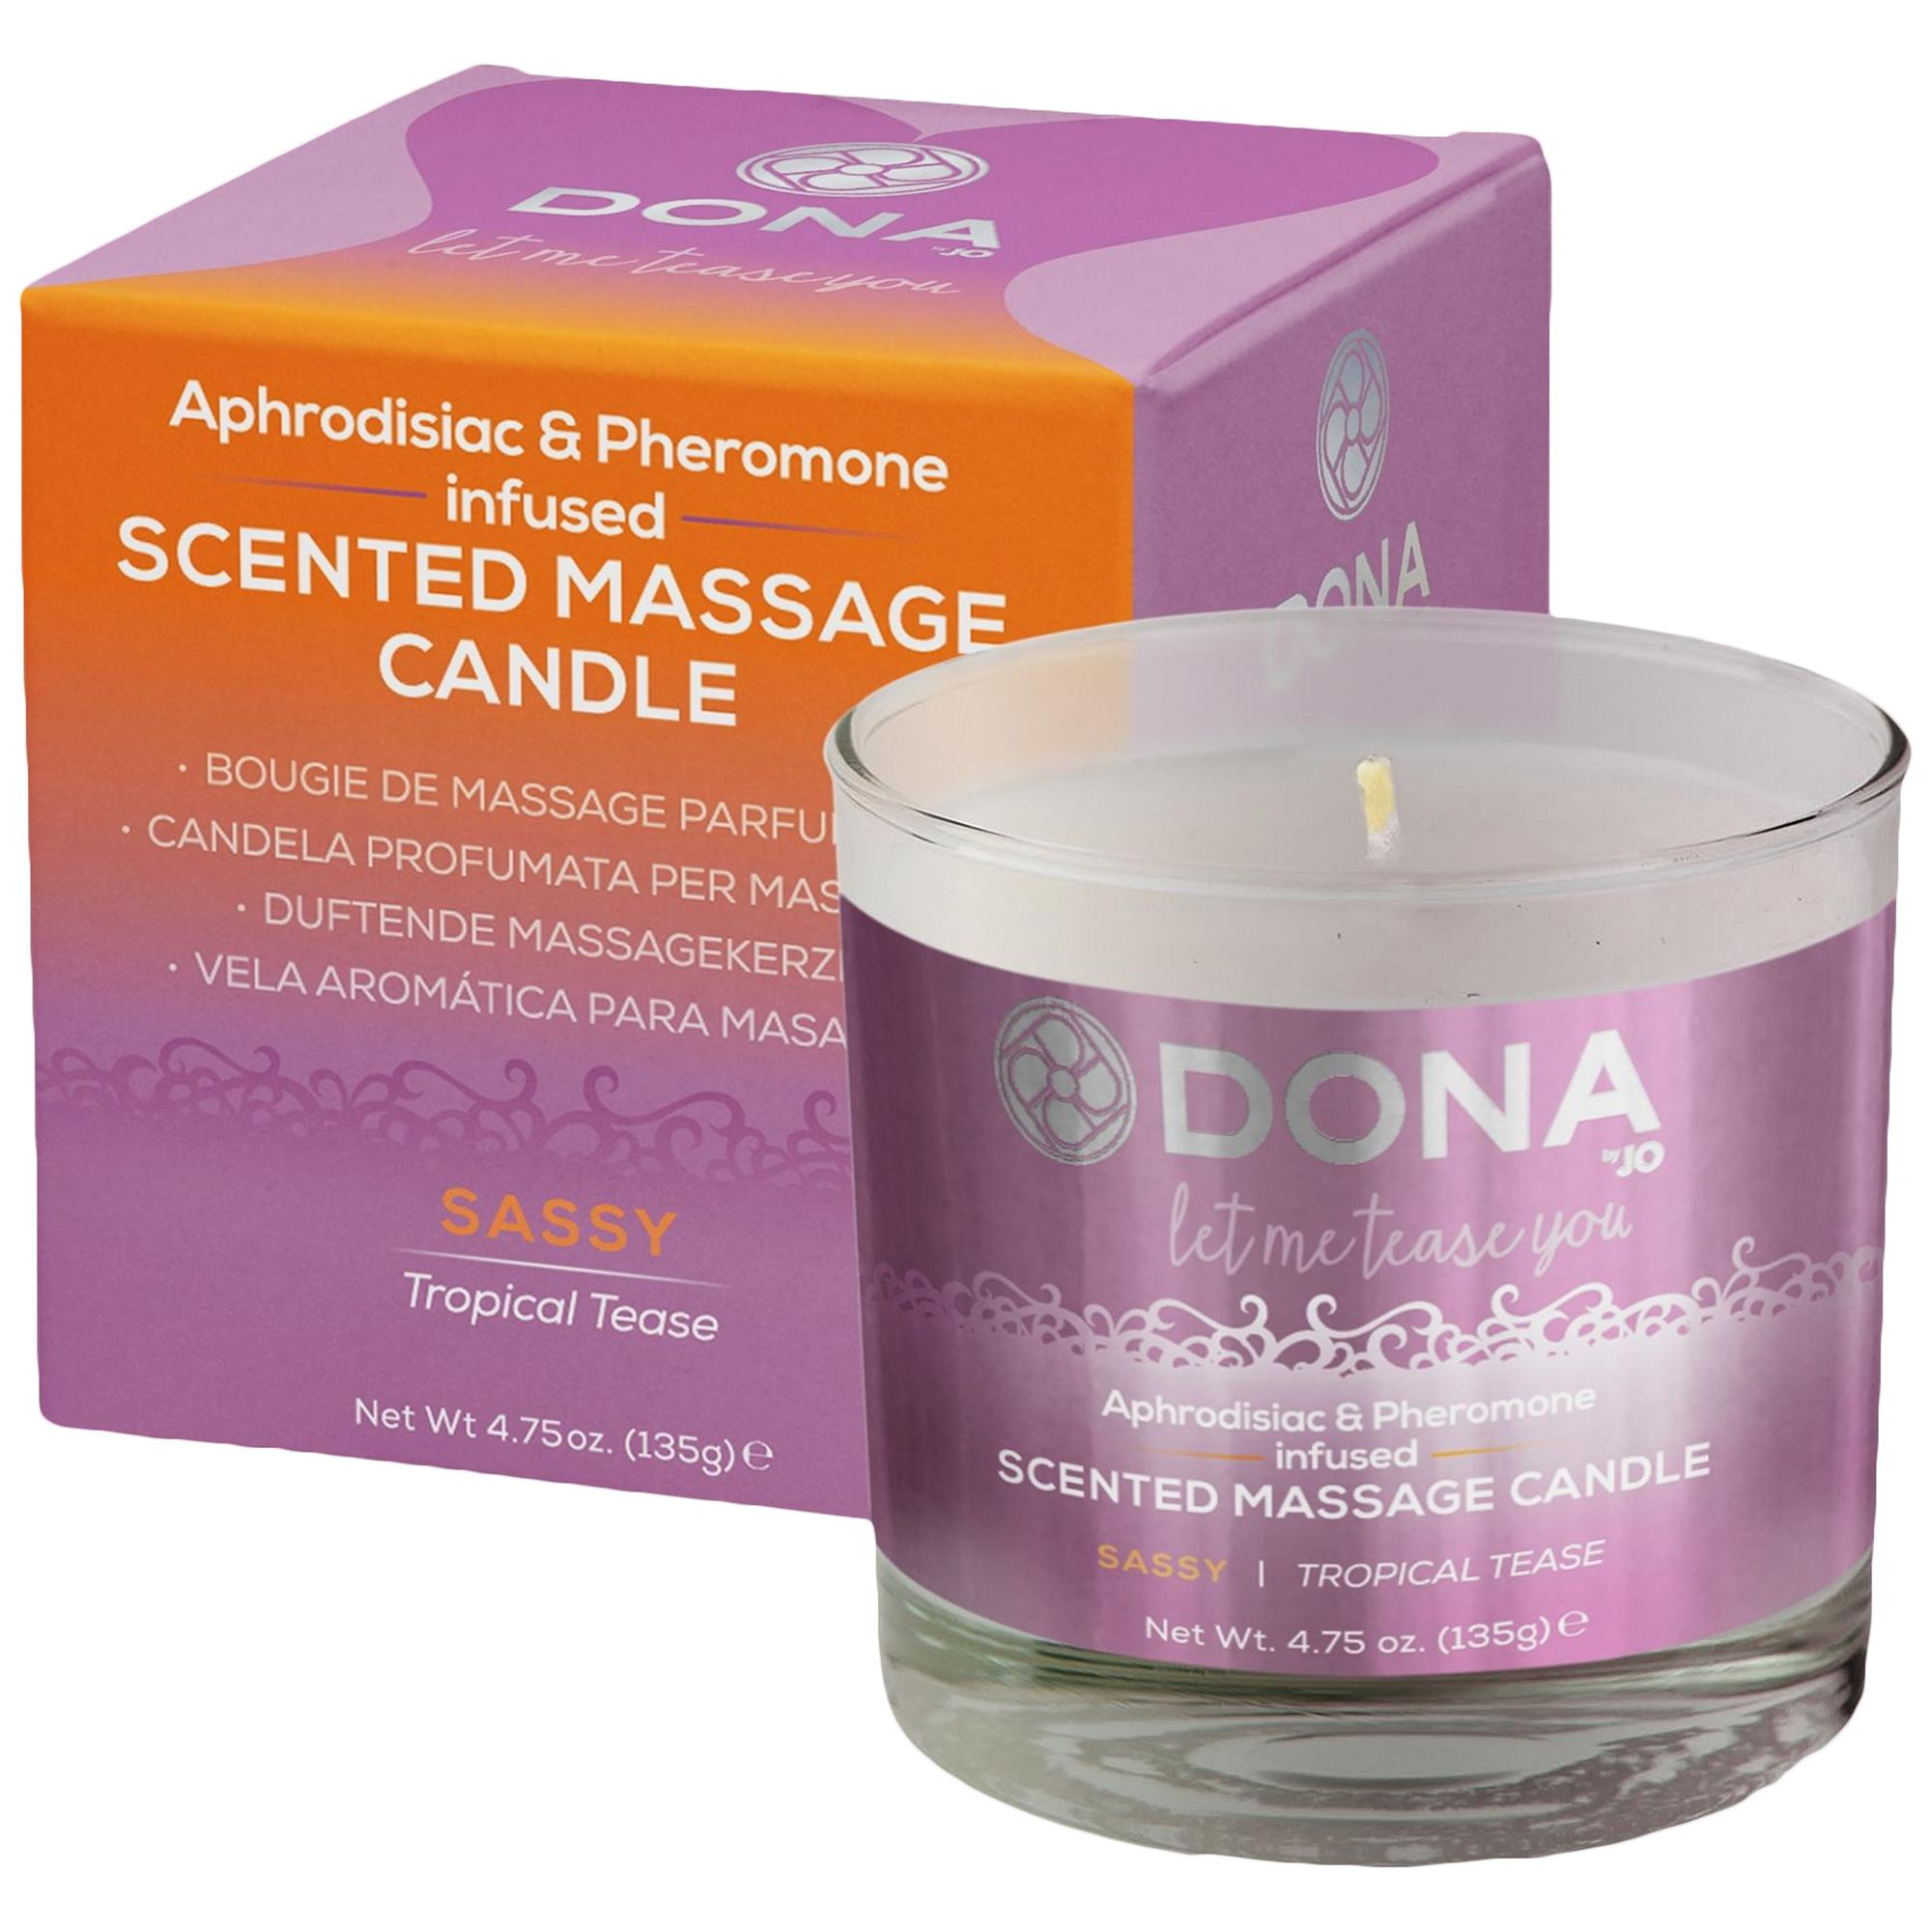 Scented massage candle - sassy | Apotek, Massage, Massageljus | Intimast.se - Sexleksaker